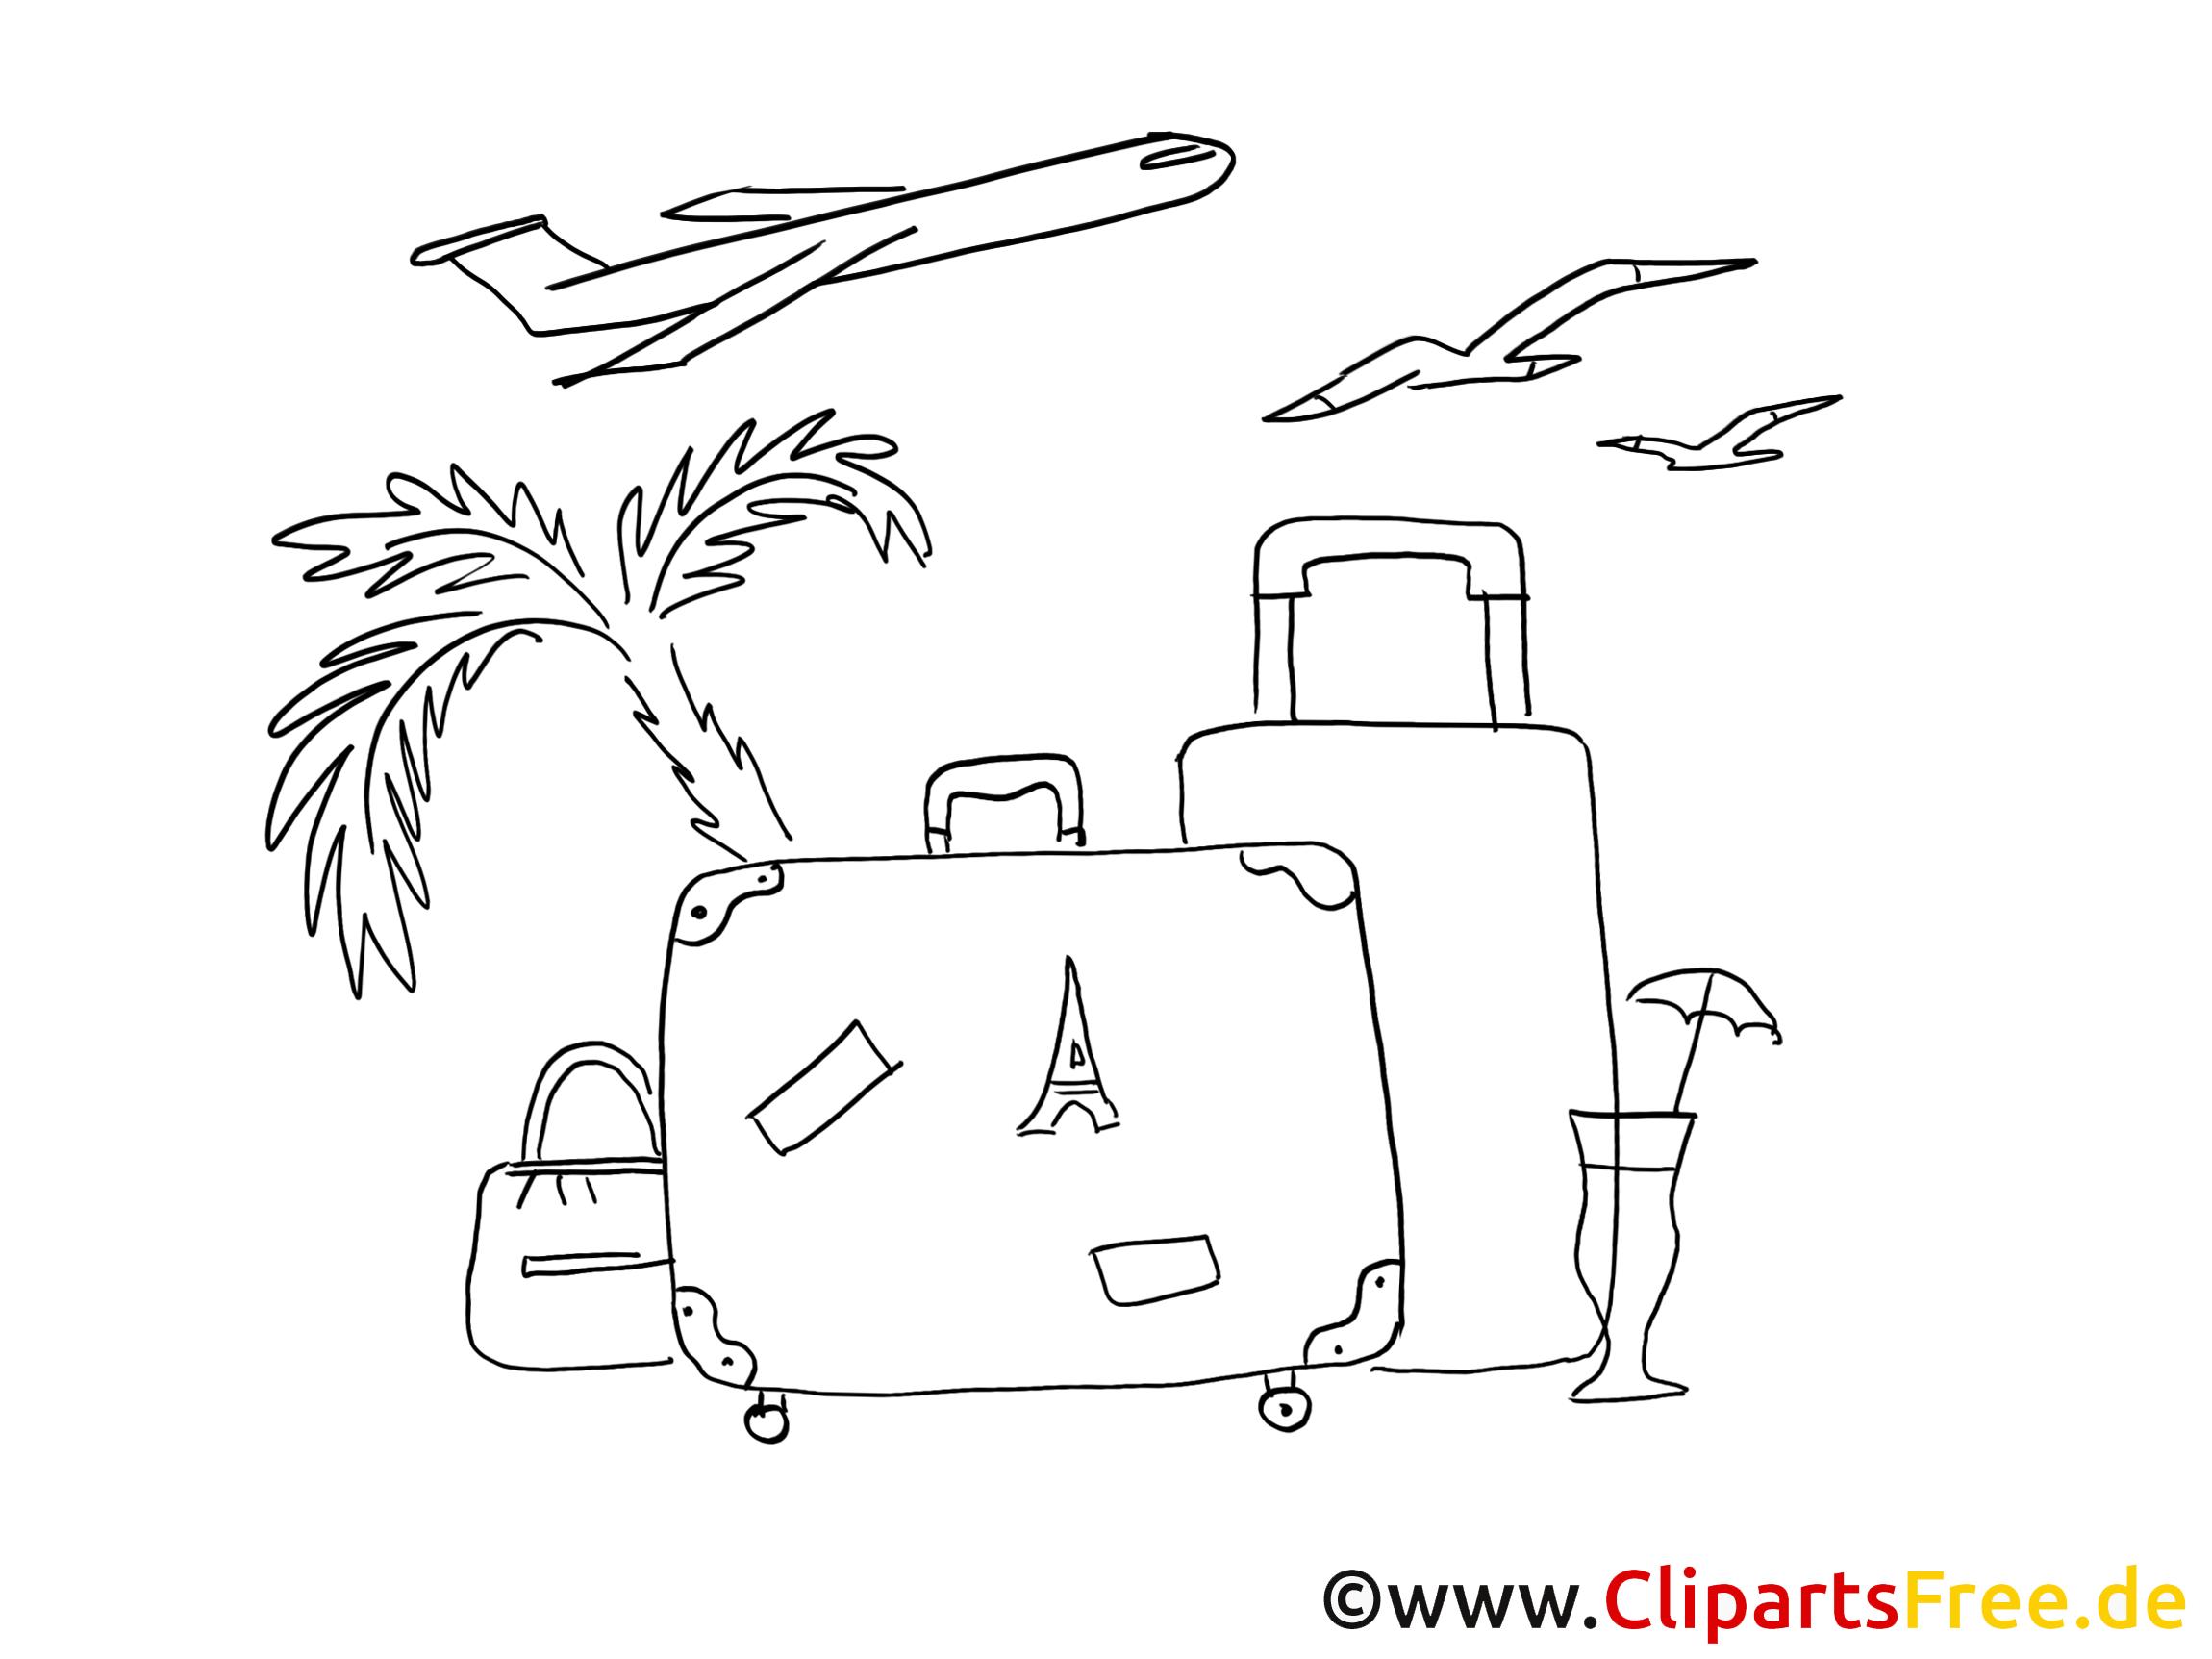 Urlaub malvorlage  PNG Urlaub Gratis Transparent Urlaub Gratis.PNG Images. | PlusPNG